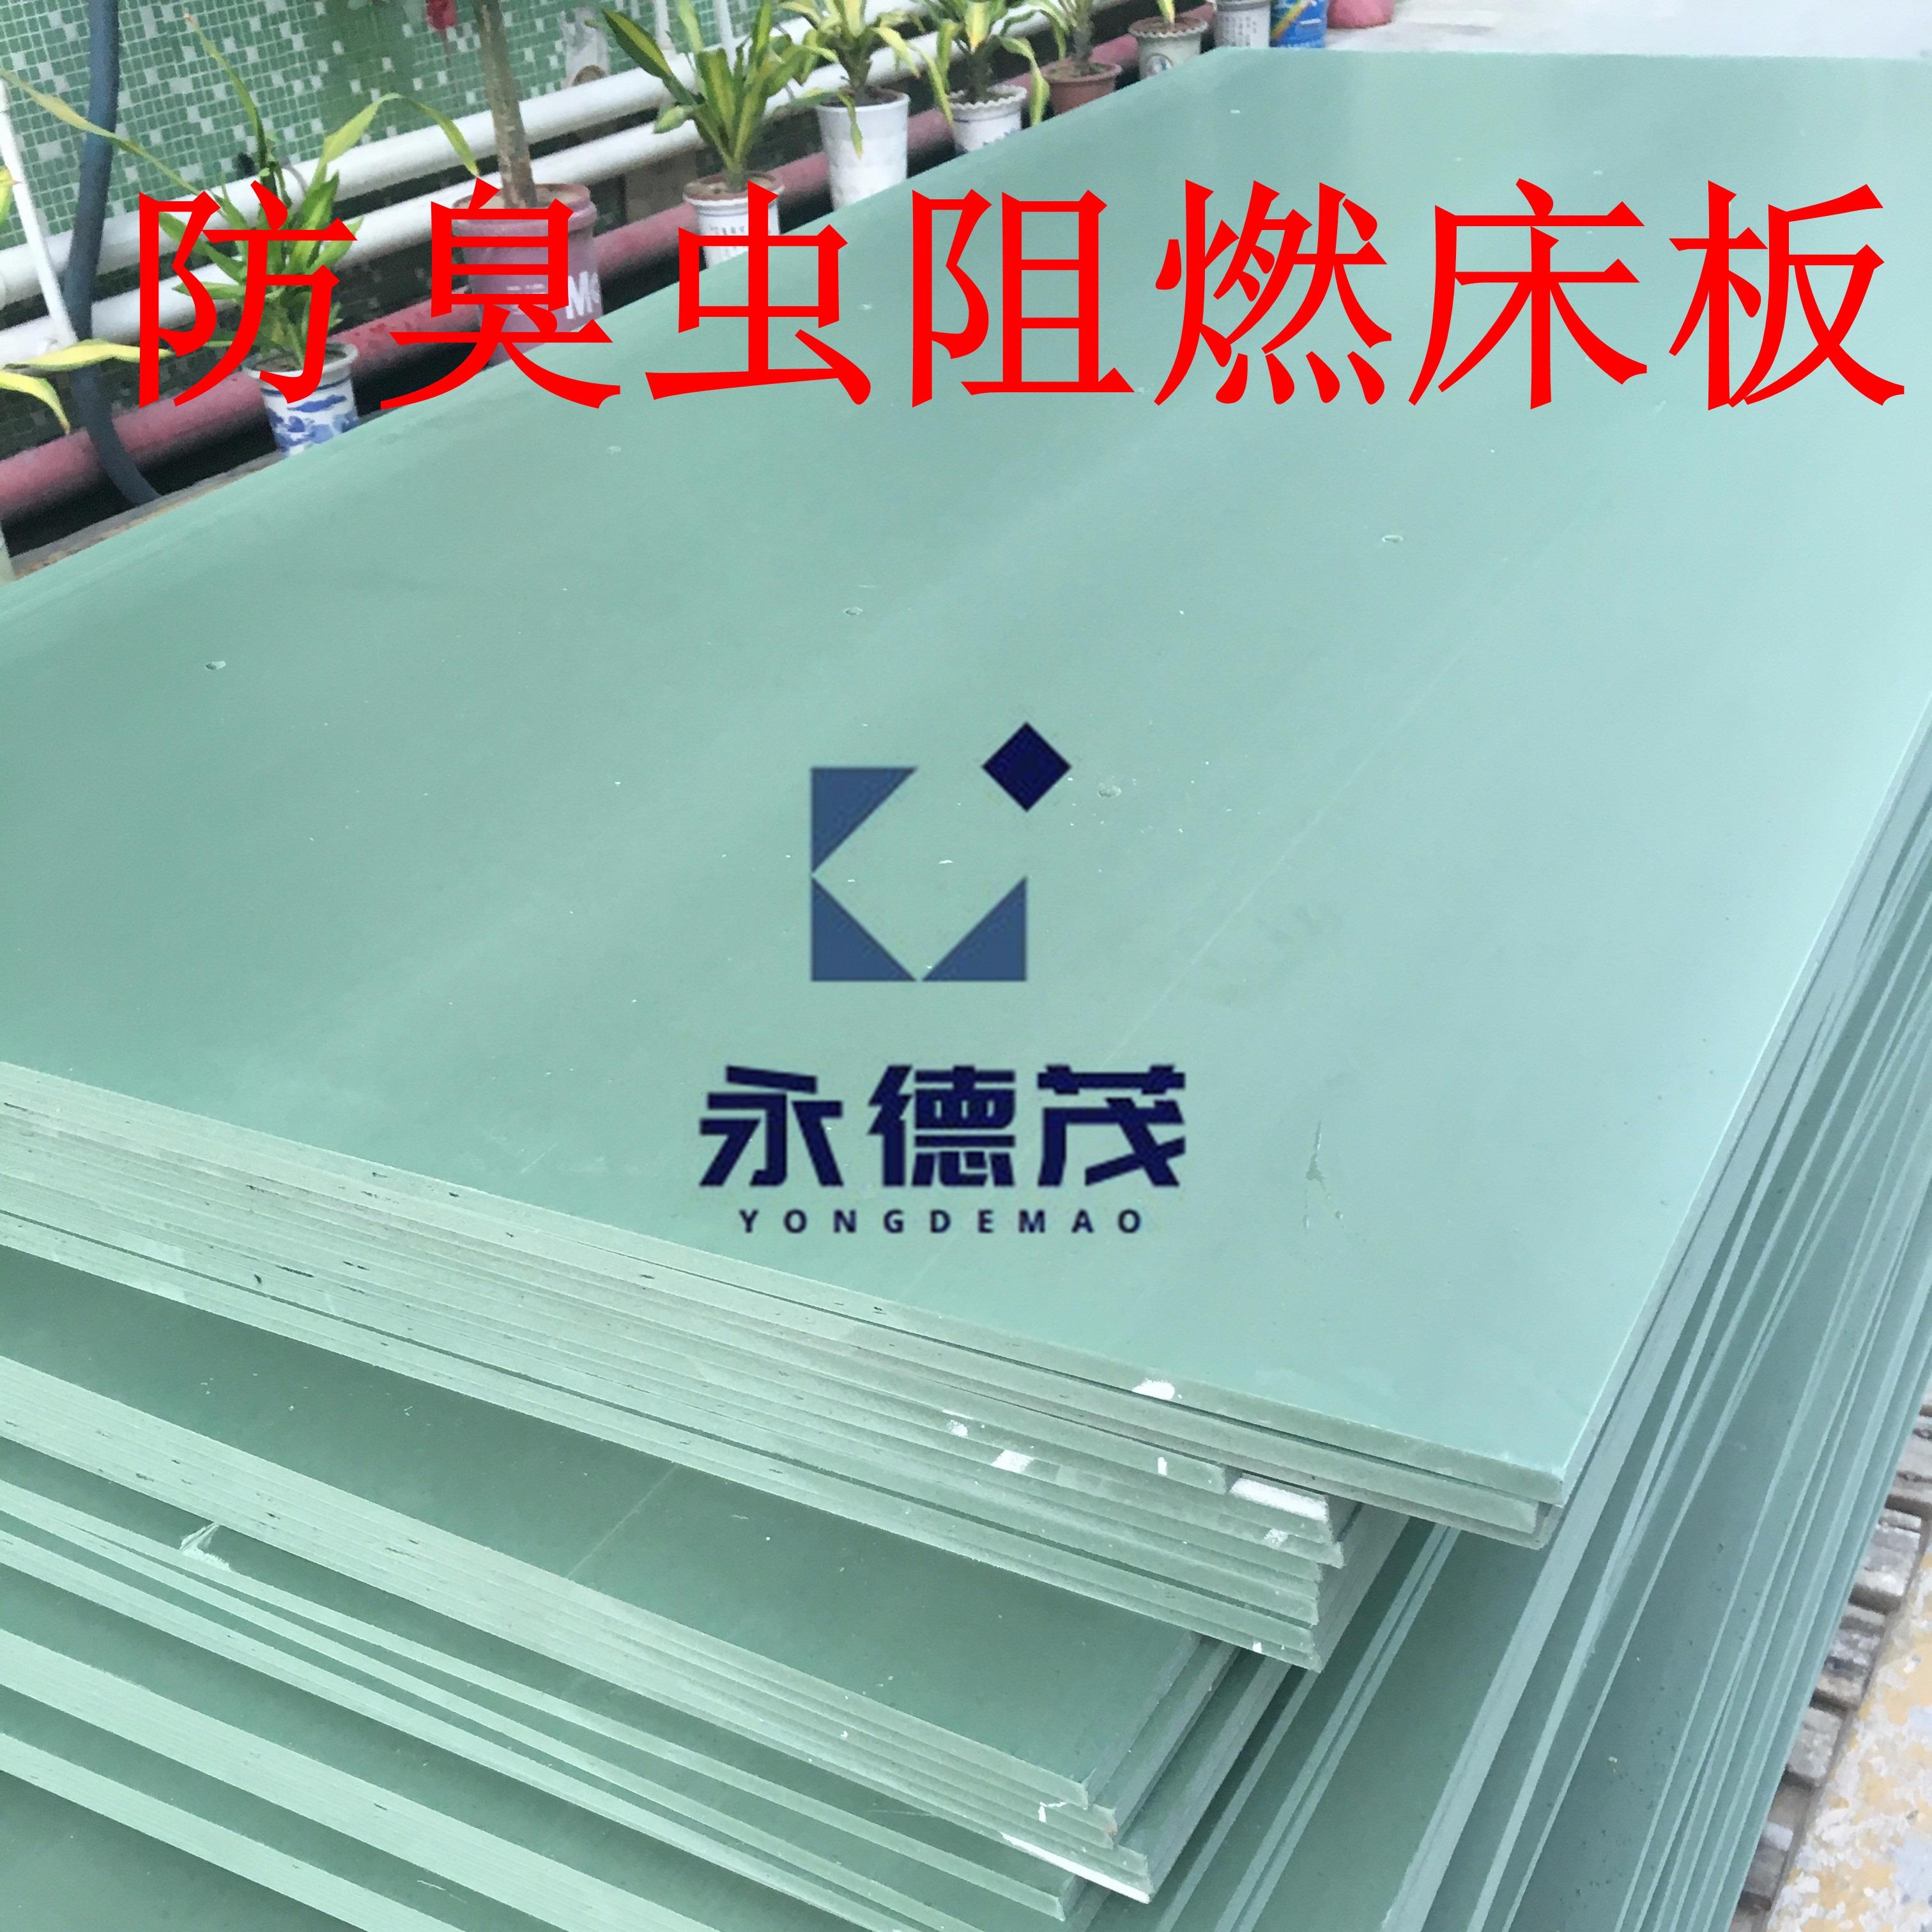 PVC塑胶床板 防臭虫 阻燃 0.9/1.2米*1.9米 防水防潮无毒无味 宿舍工厂